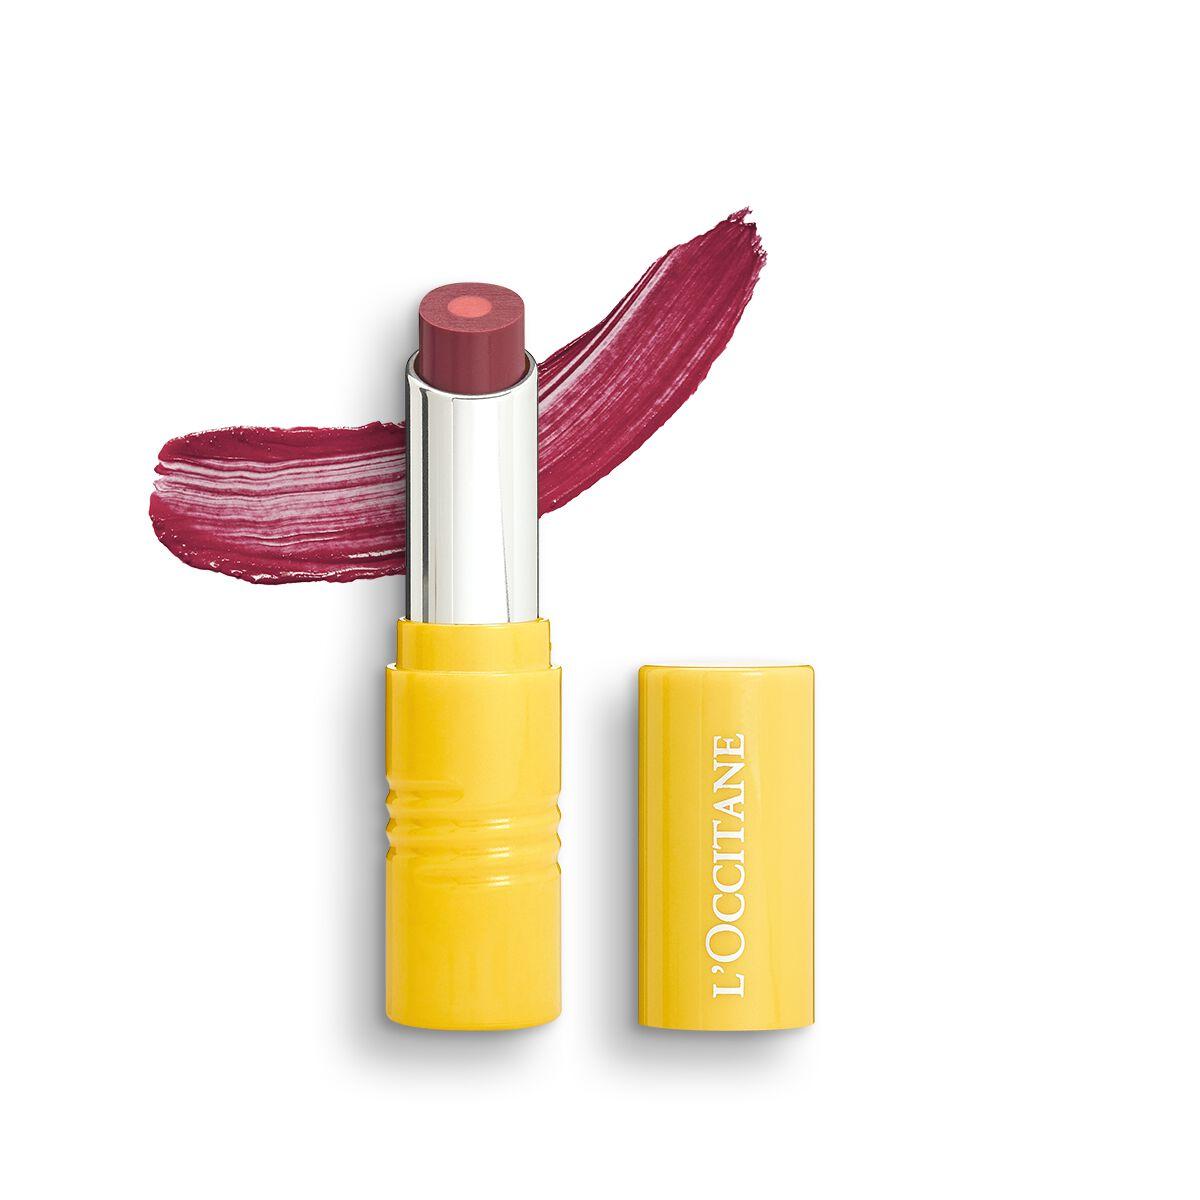 Fruity Lipstick - Plum Plum Girl 28 g.